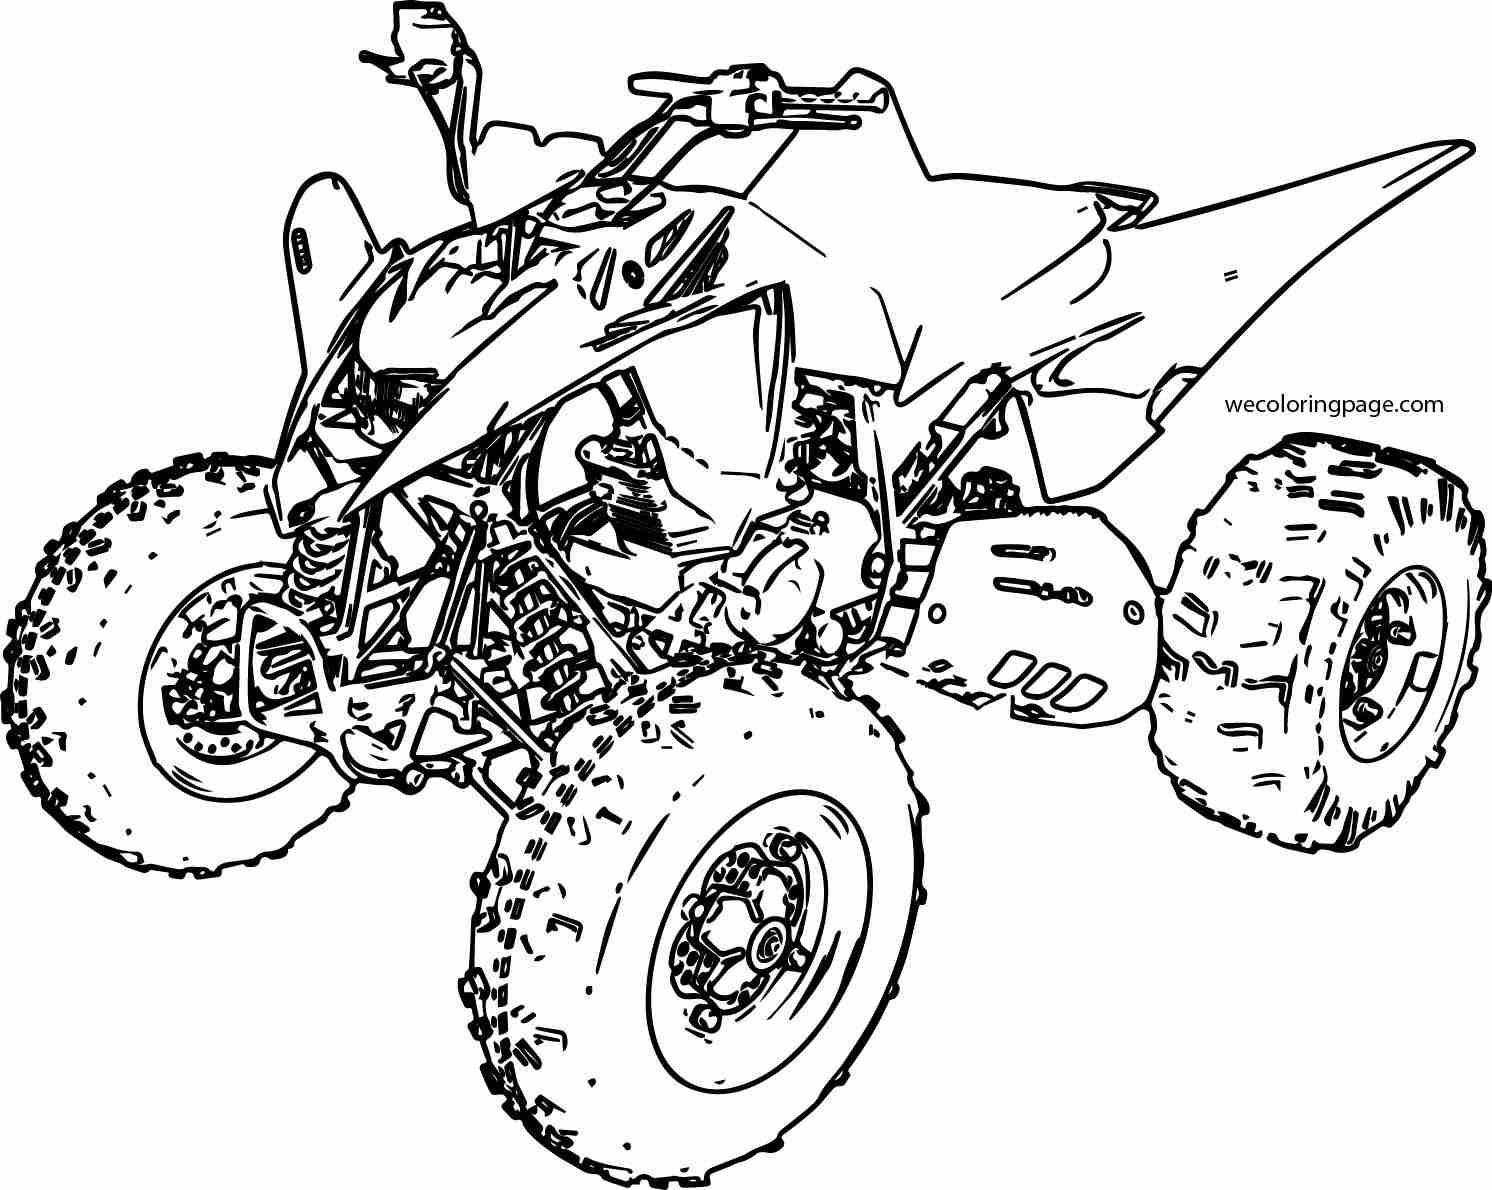 1492x1190 Sport Atv Yamaha Raptor Coloring Page Wecoloringpage And Wheeler